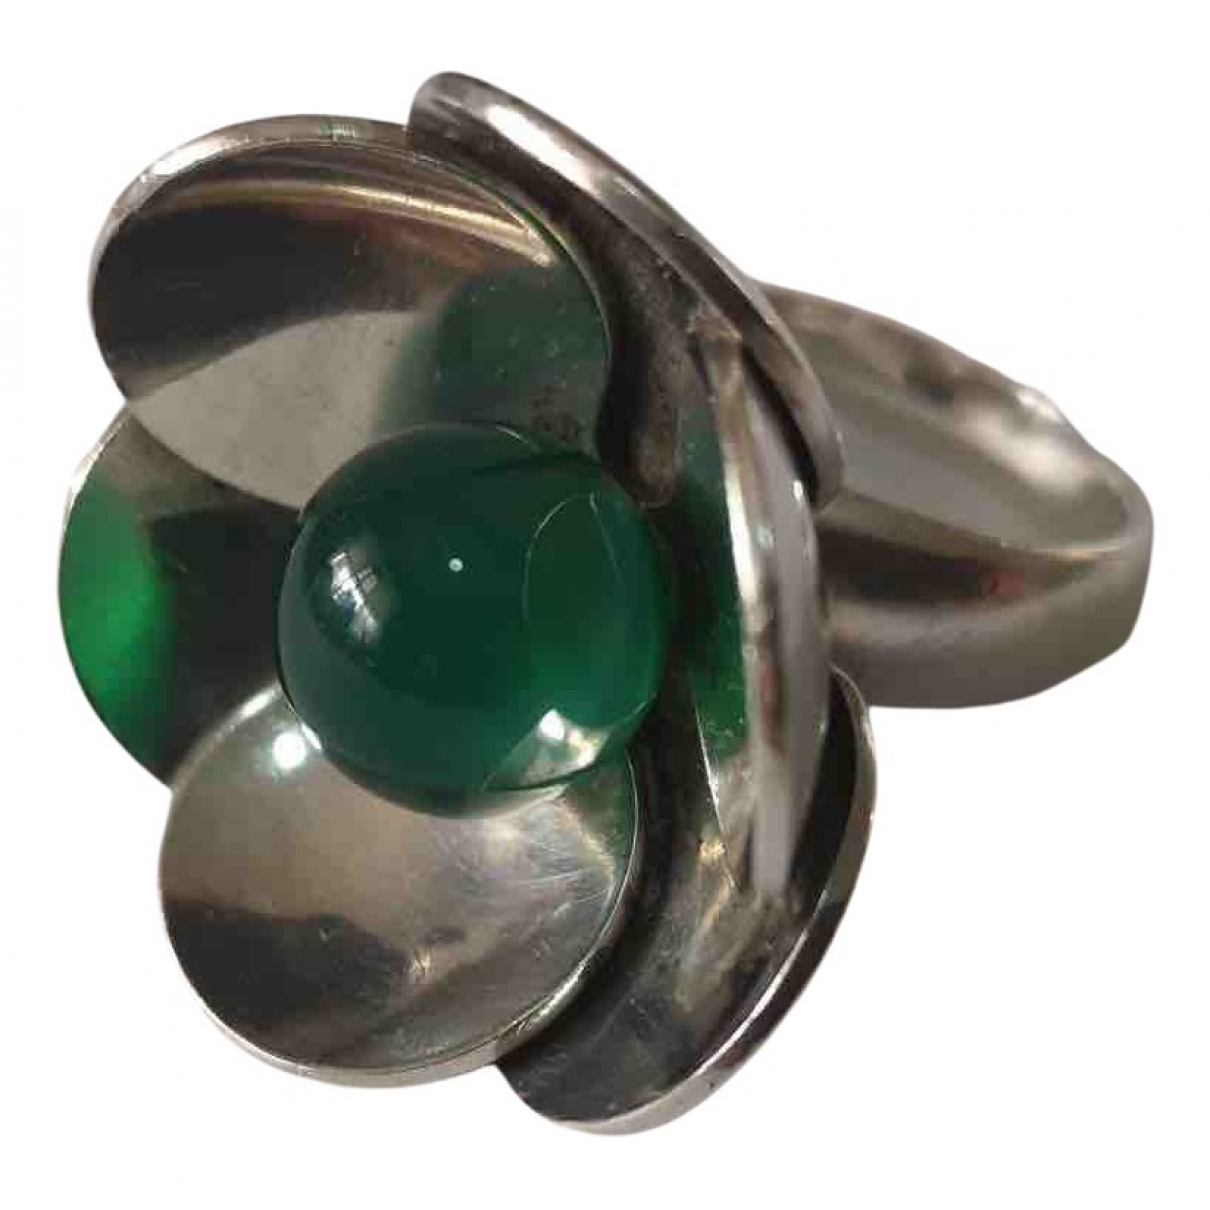 Georg Jensen \N Ring in  Gruen Silber